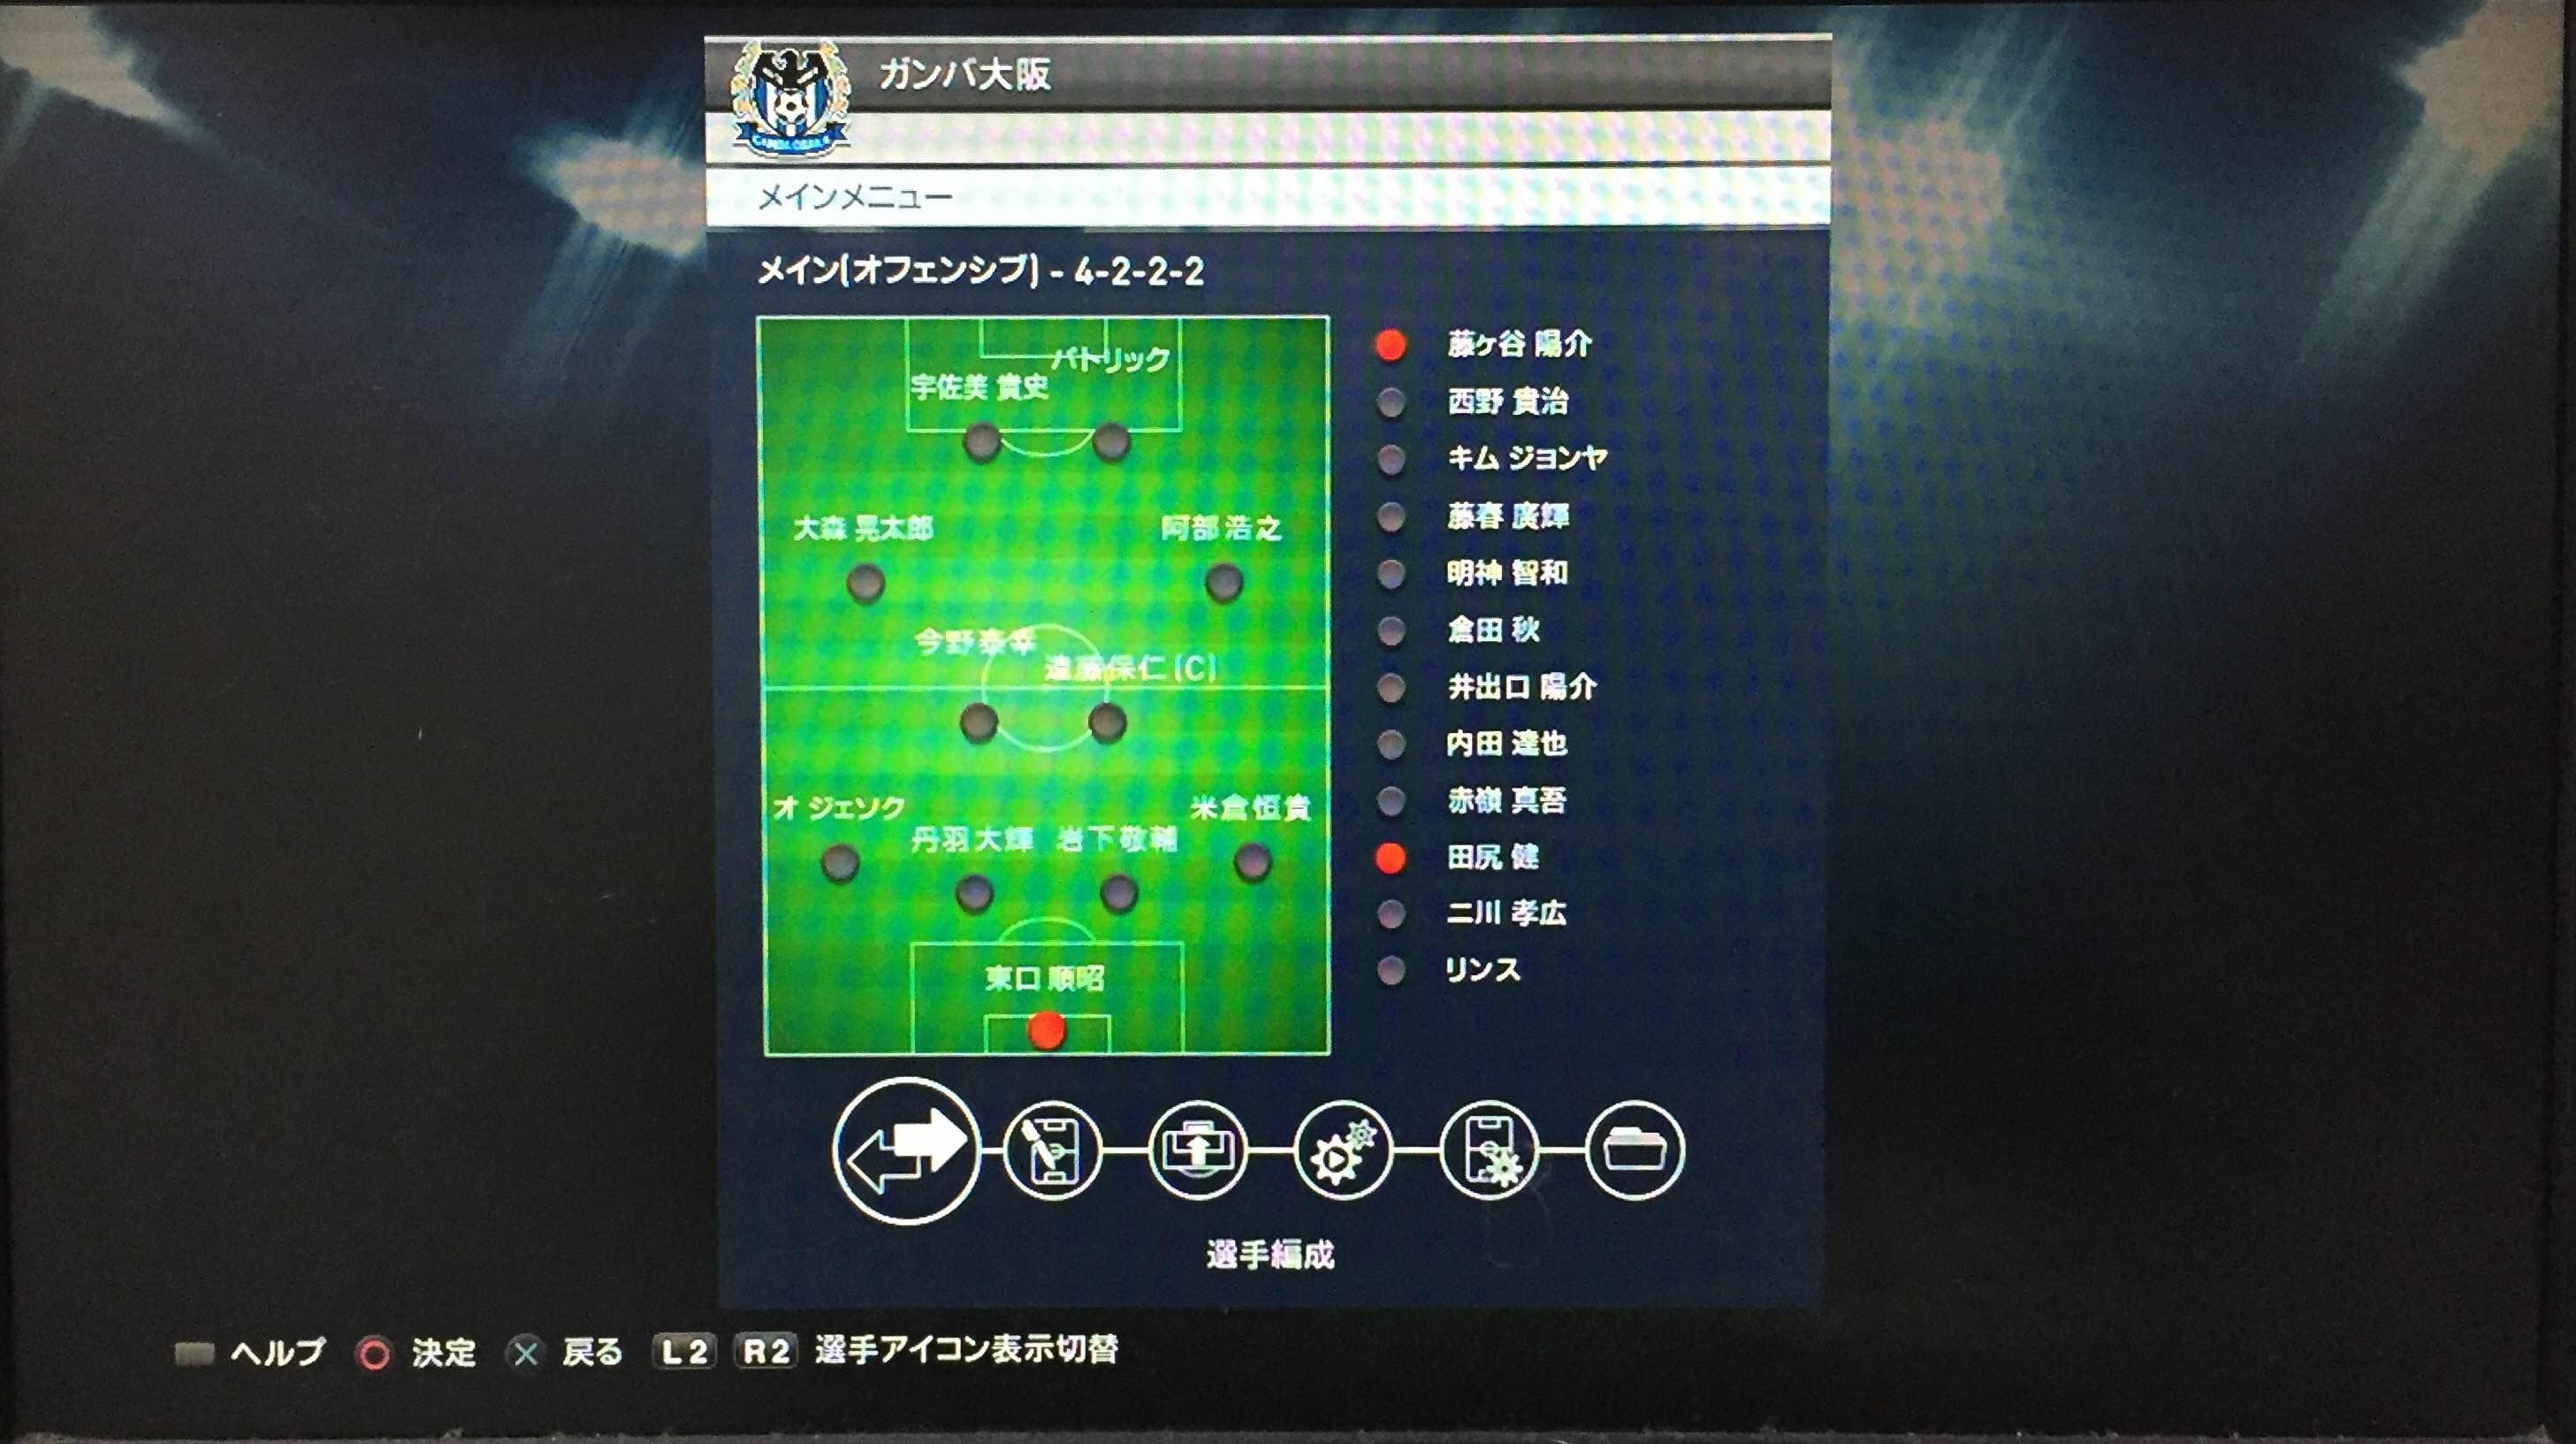 jリーグ 試験データ4